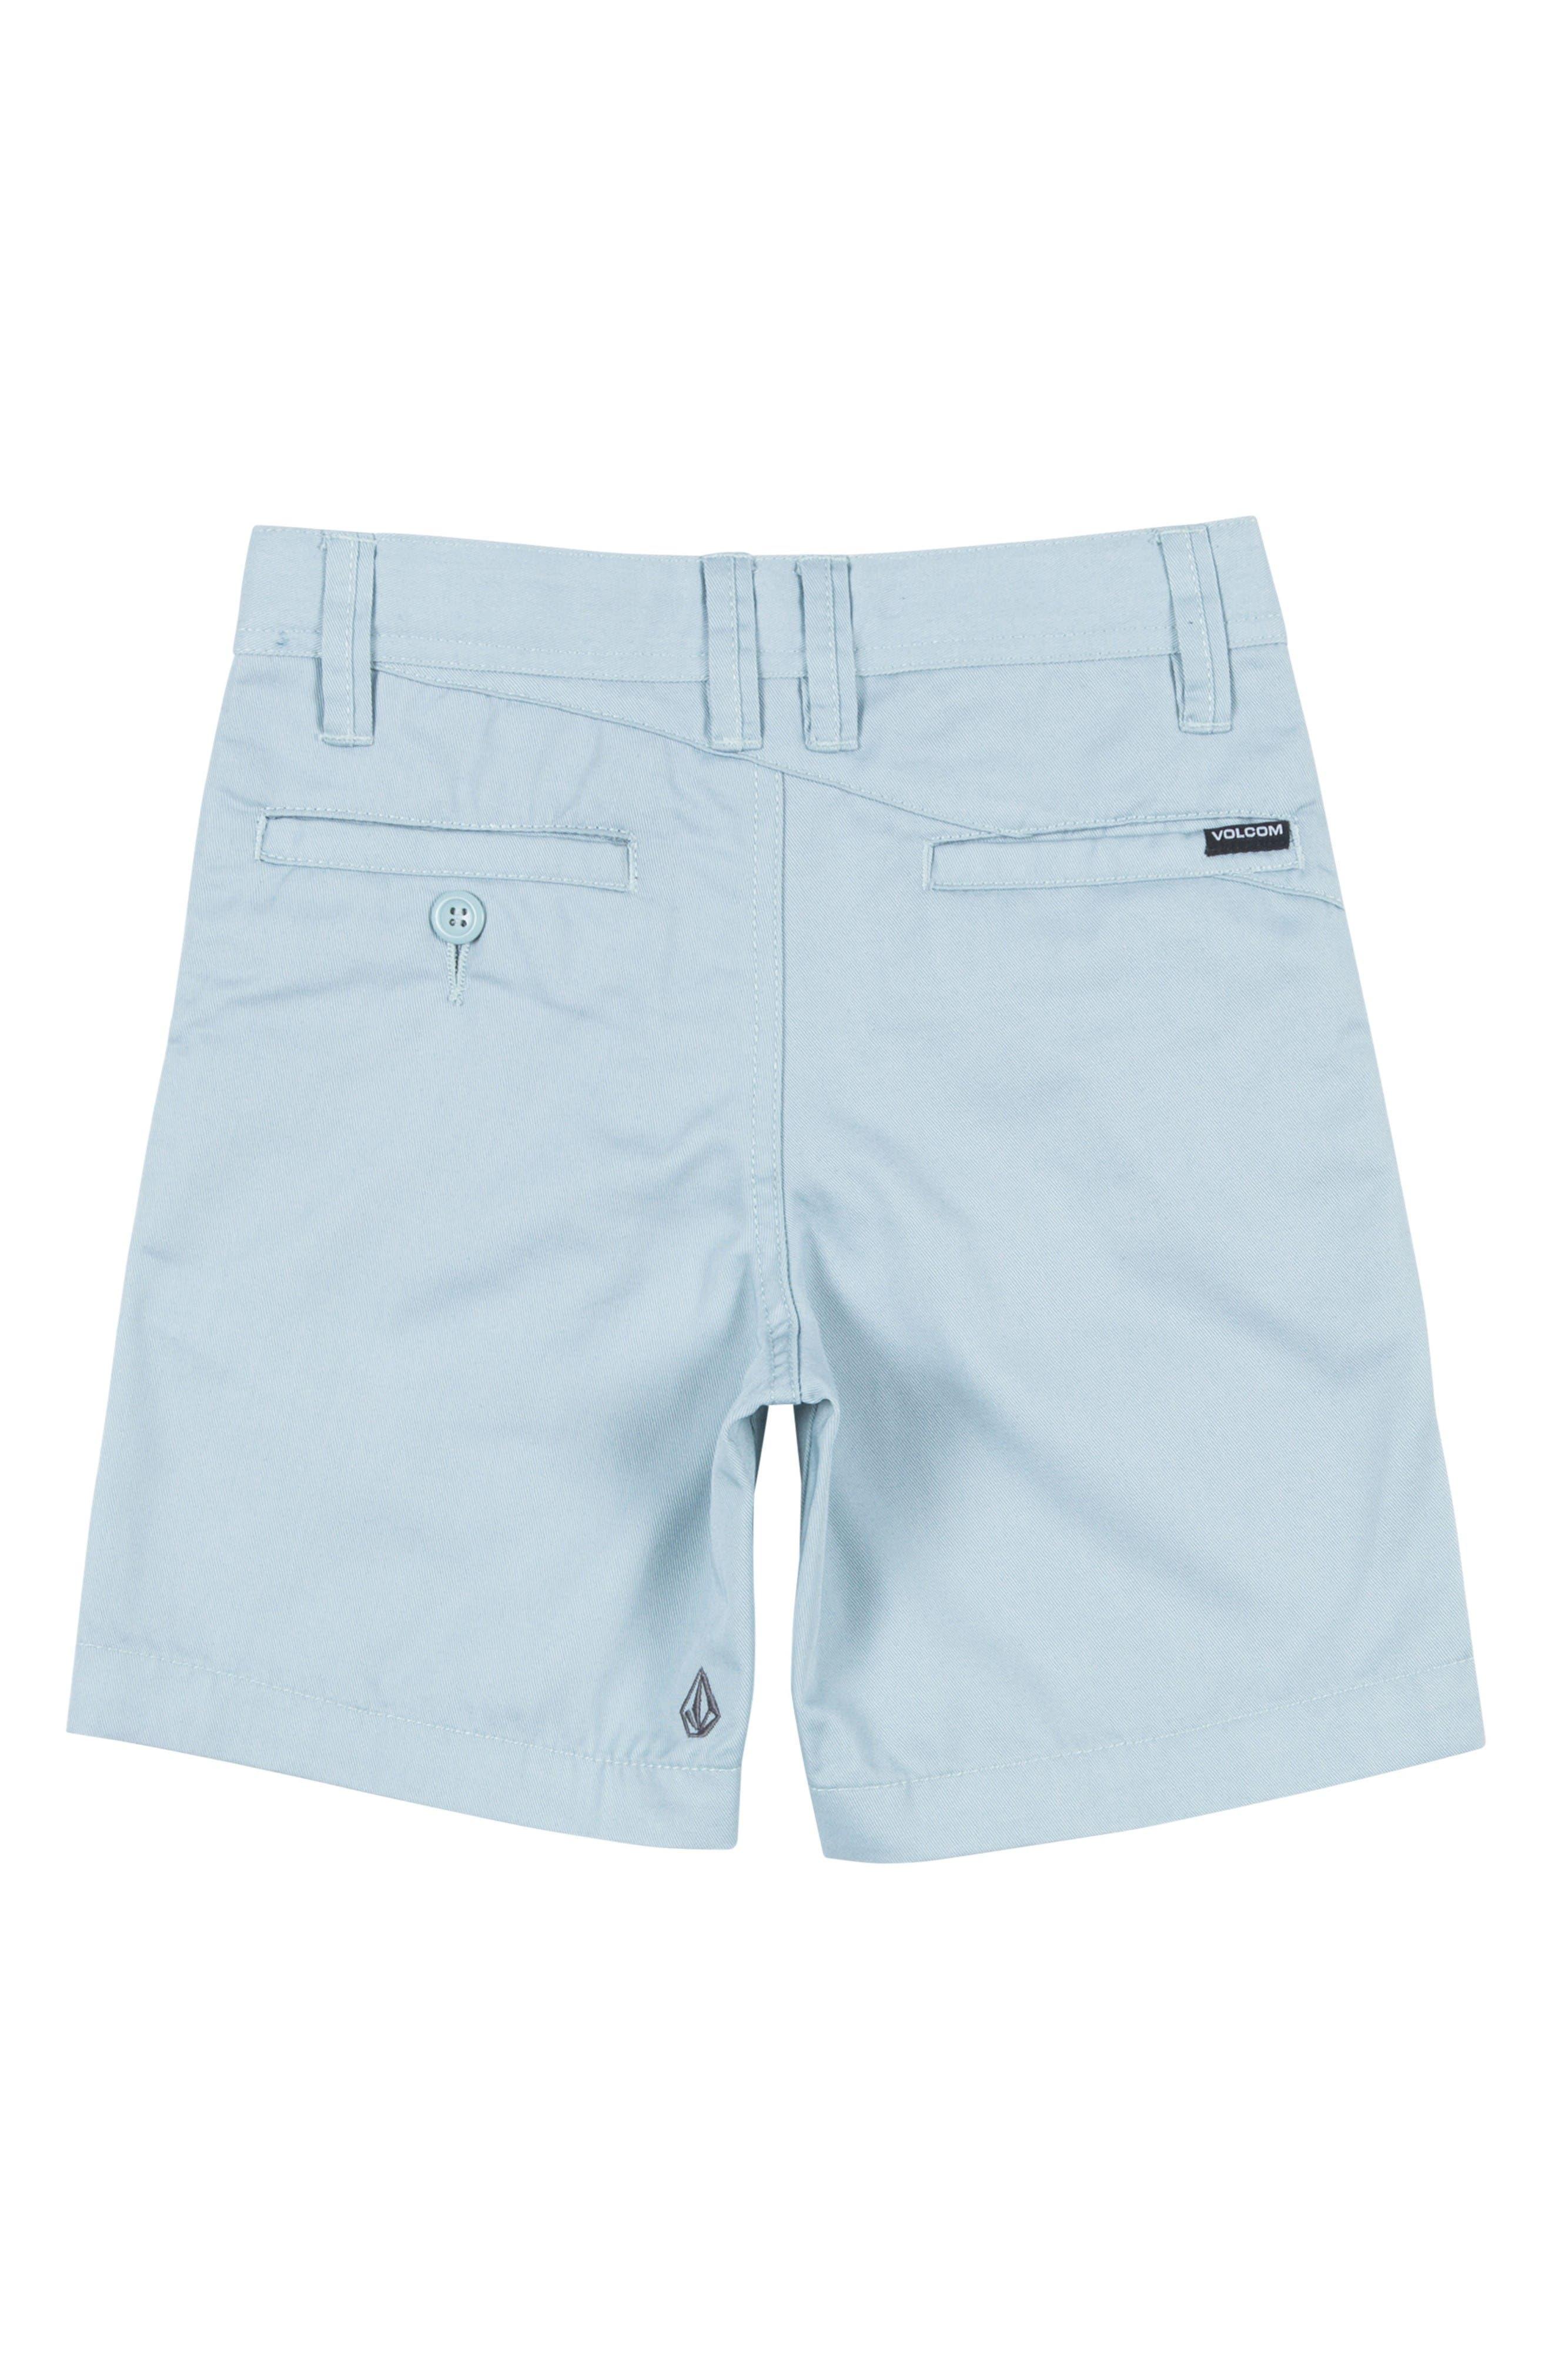 Alternate Image 2  - Volcom 'Modern' Chino Shorts (Toddler Boys & Little Boys)